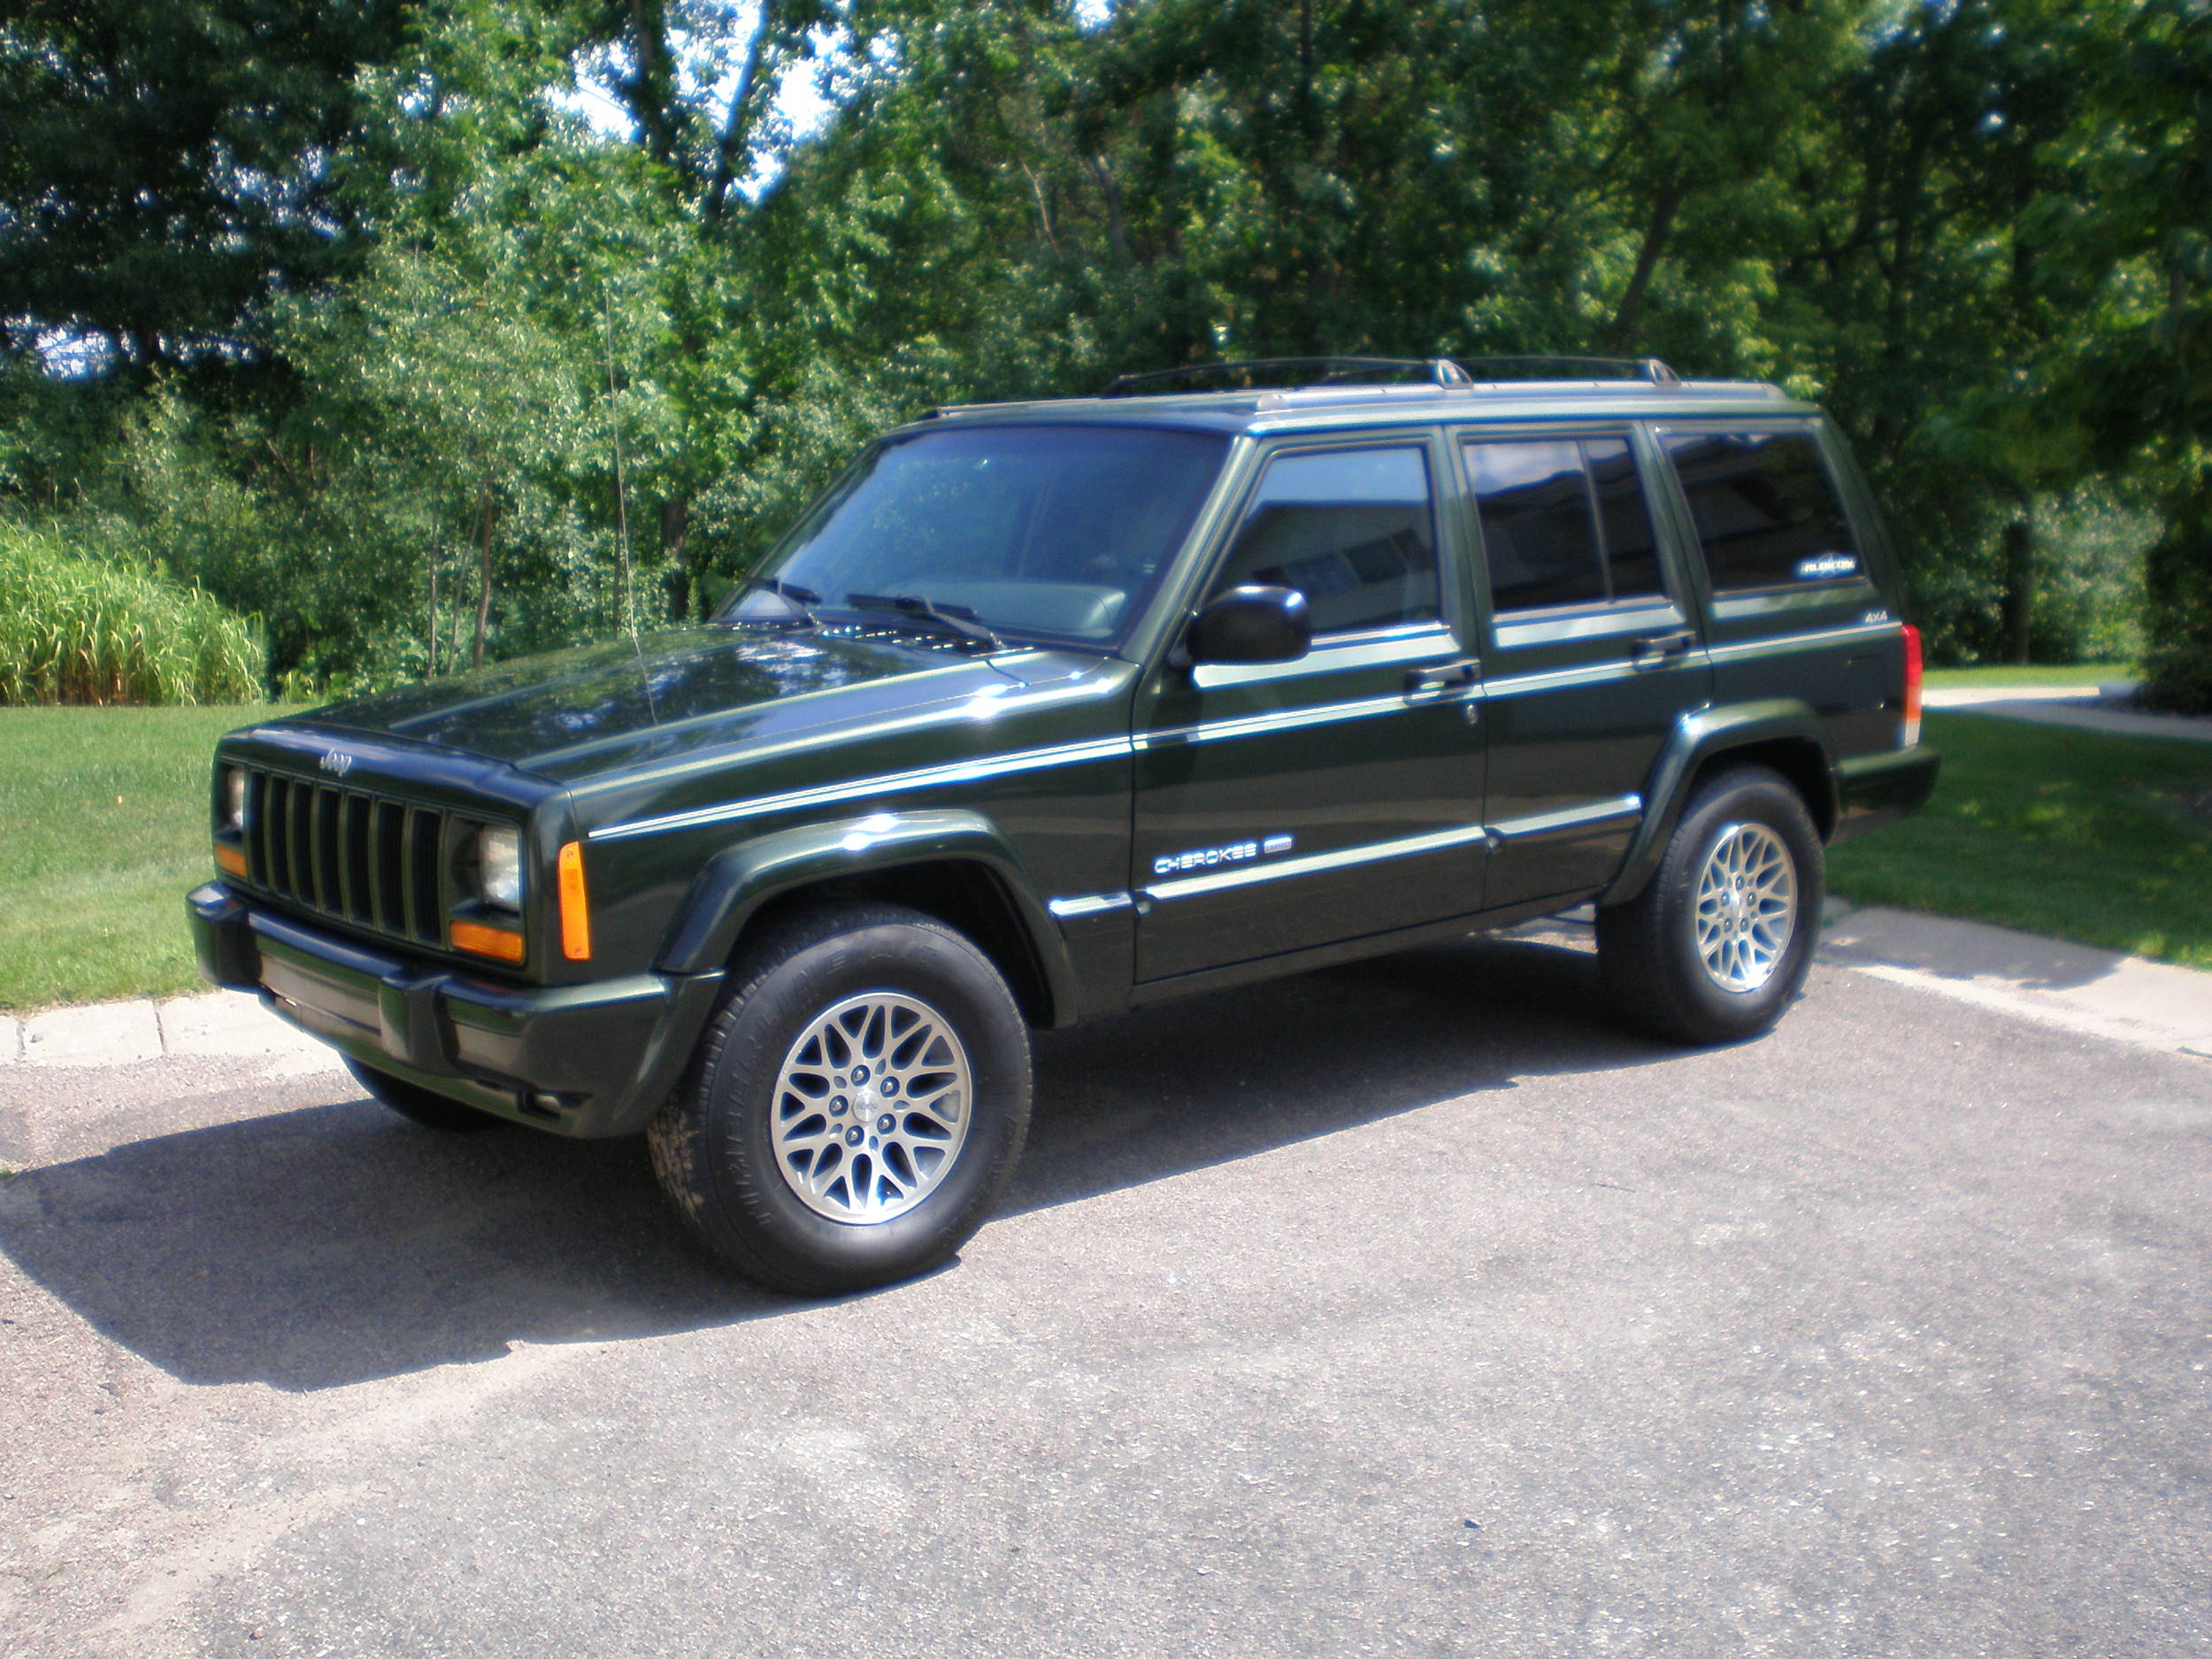 98_XJ_Jeep_Cherokee_023